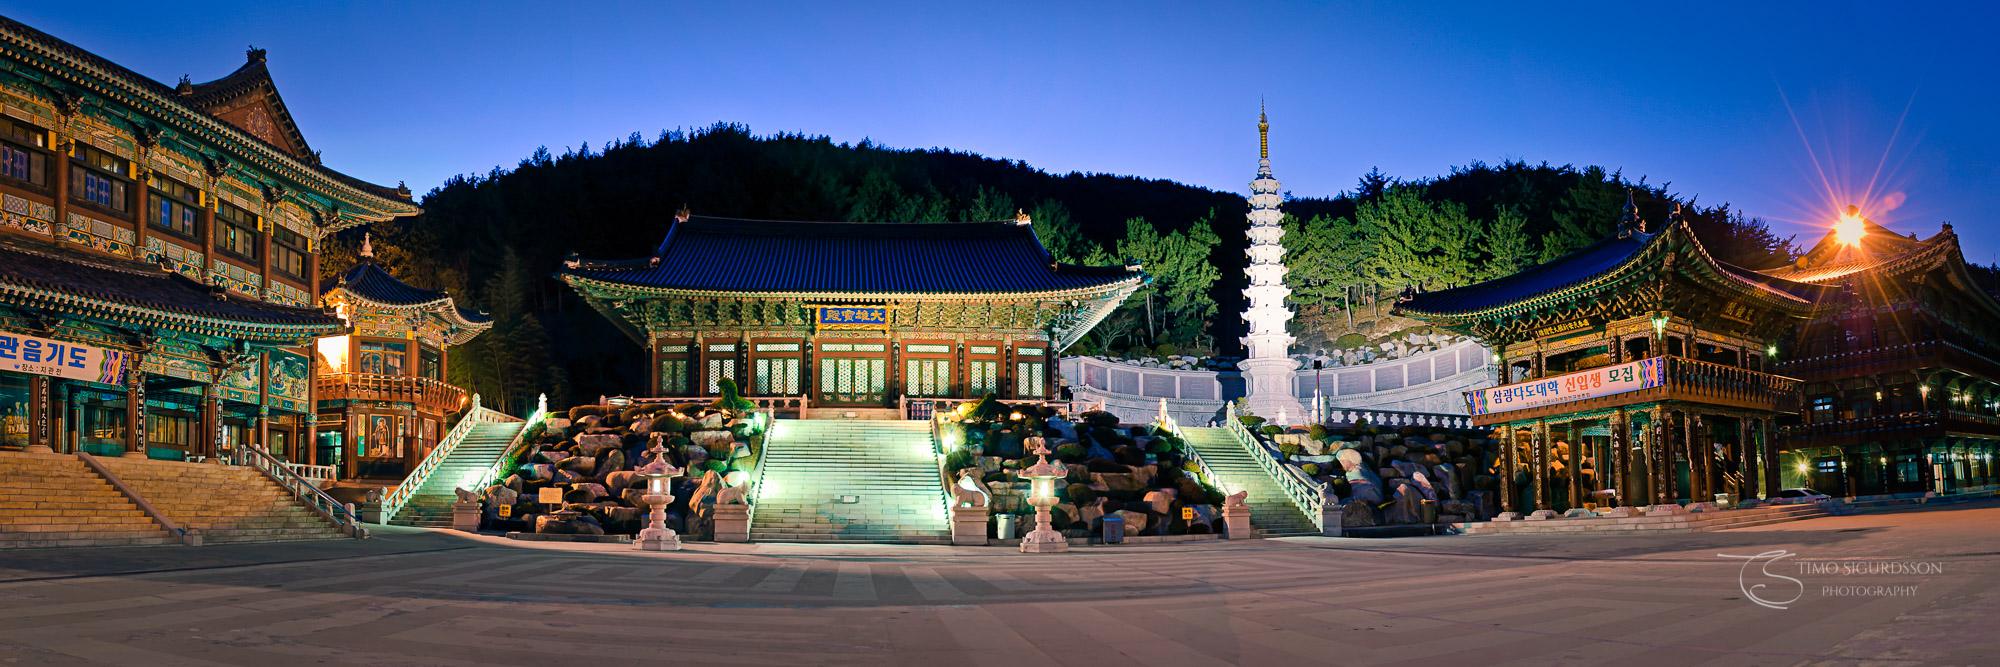 Samgwangsa Temple, Busan, South Korea. Temple panorama at night.